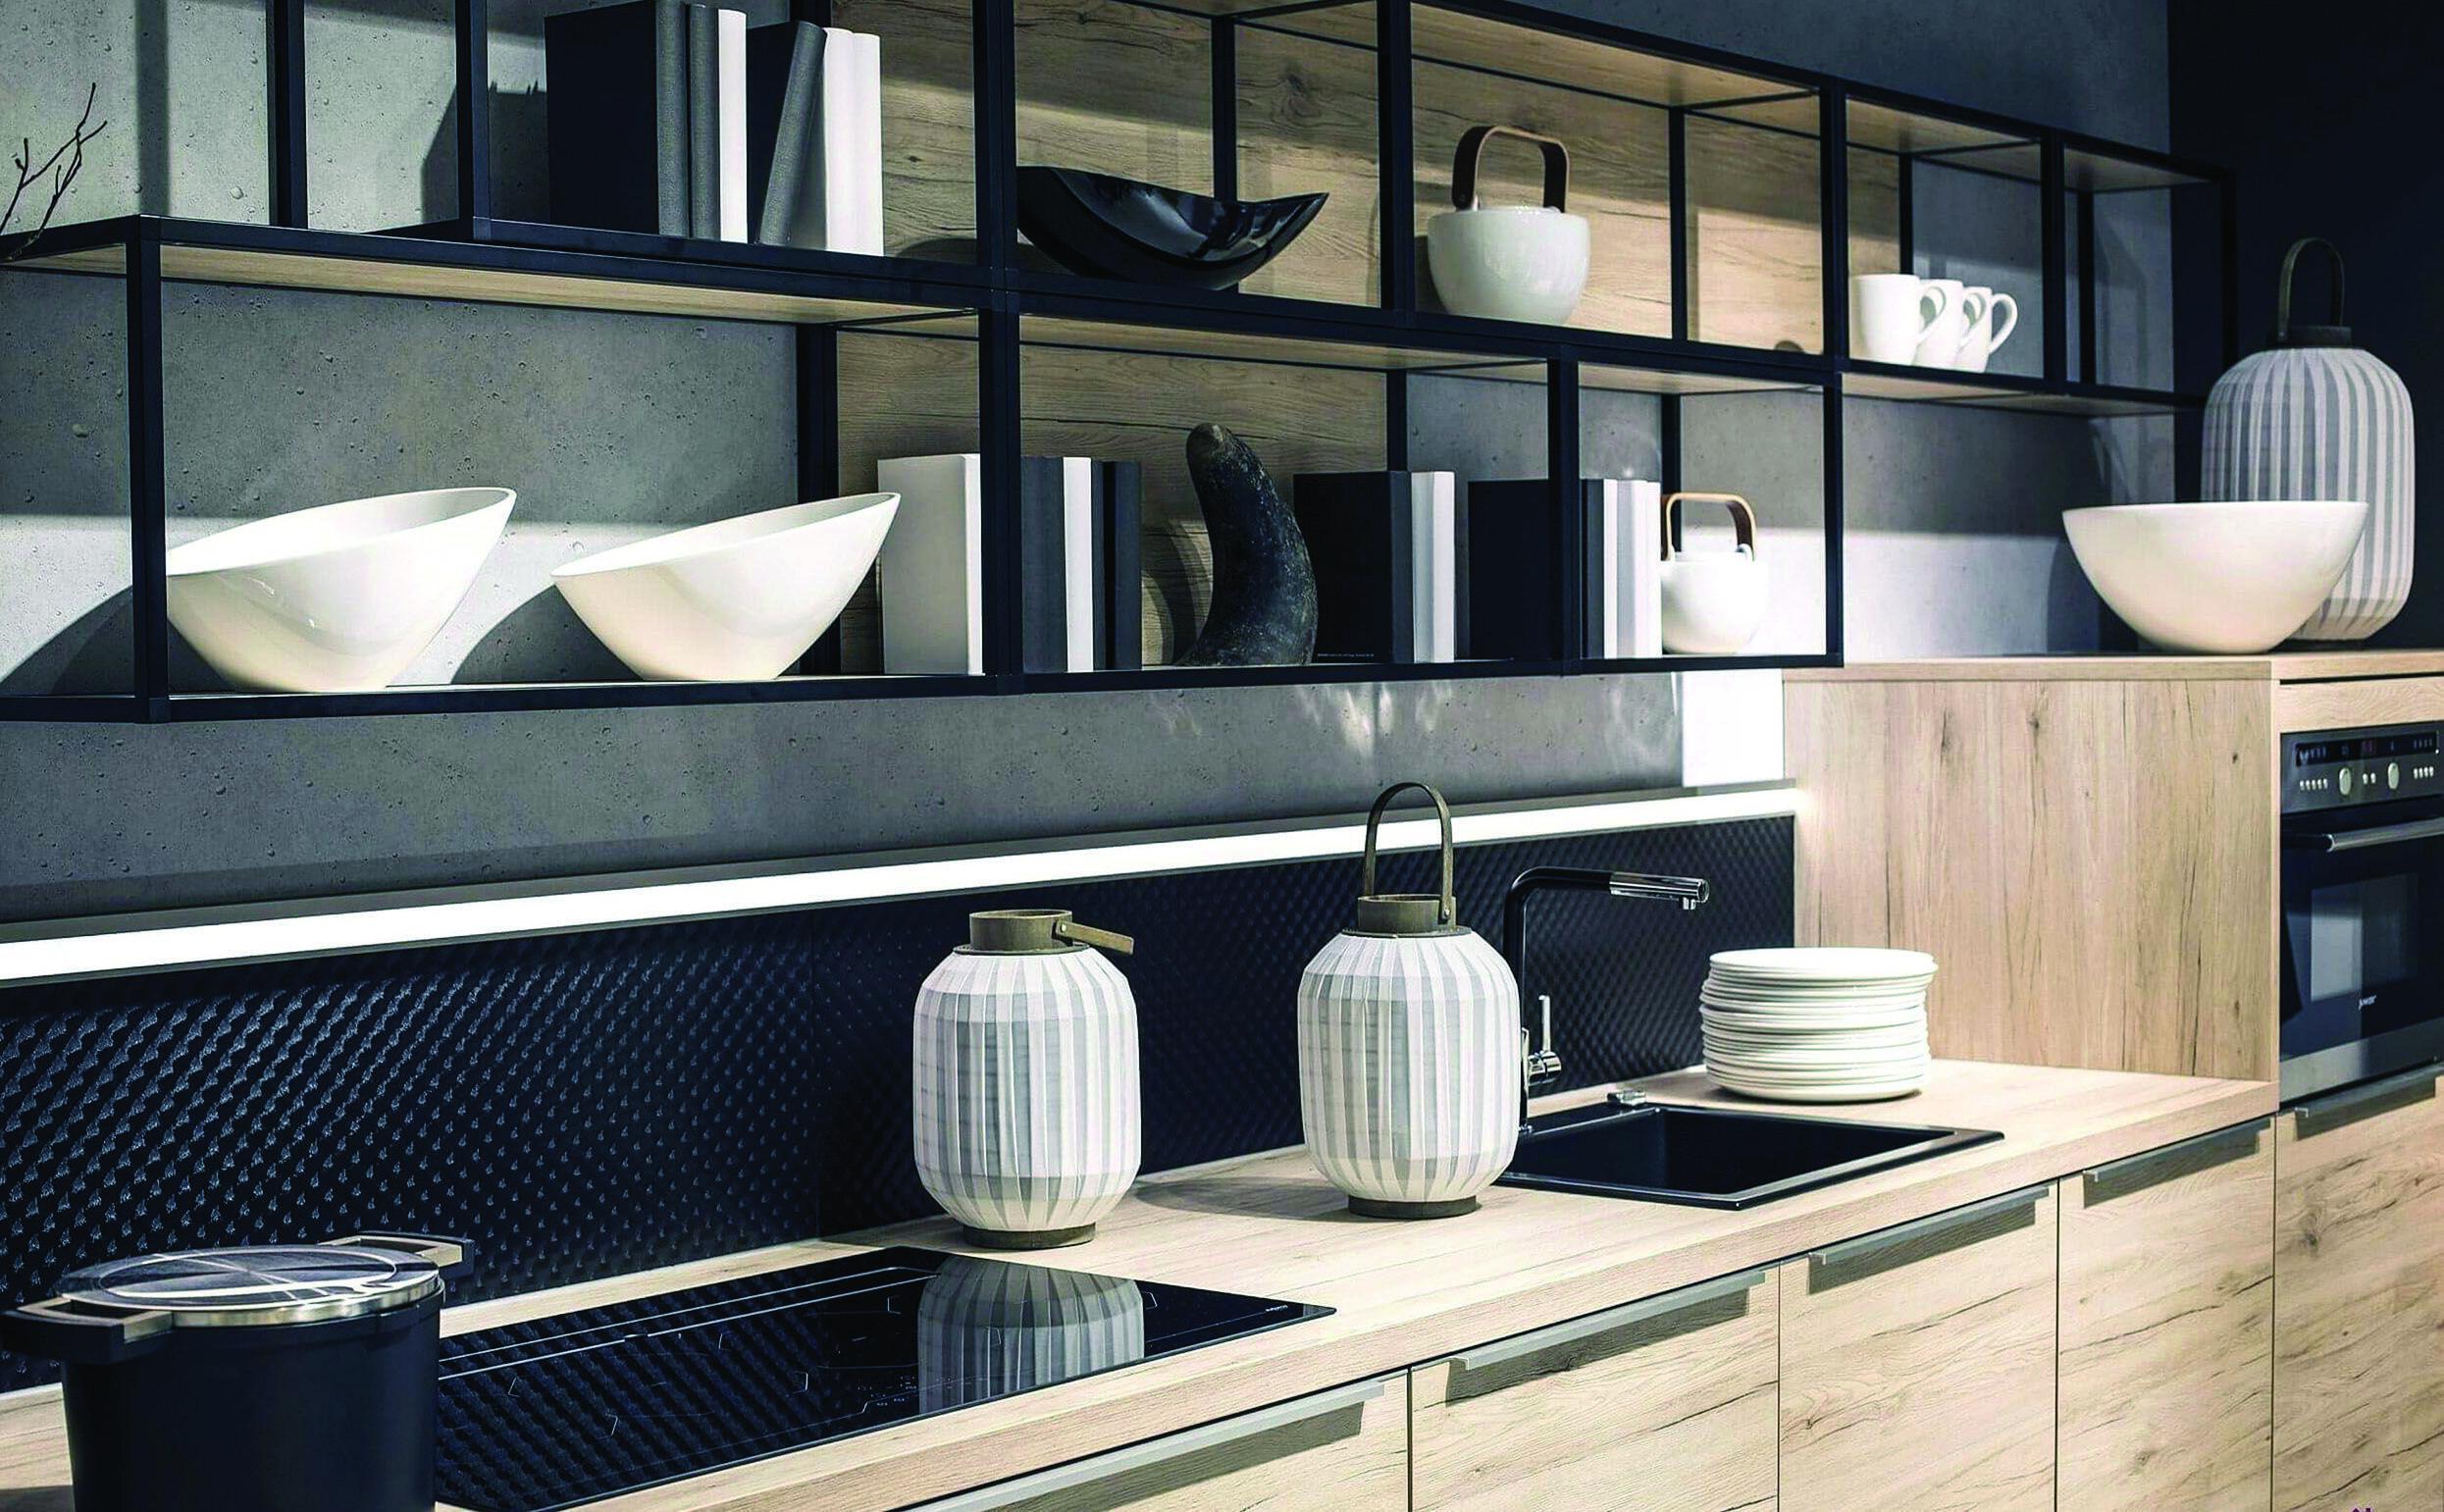 Tips For Spectacular Vintage Metal Kitchen Cabinets Craigslist Michigan Only In Miraliva Com Kitchen Shelf Design Modern Kitchen Open Kitchen Wall Shelves